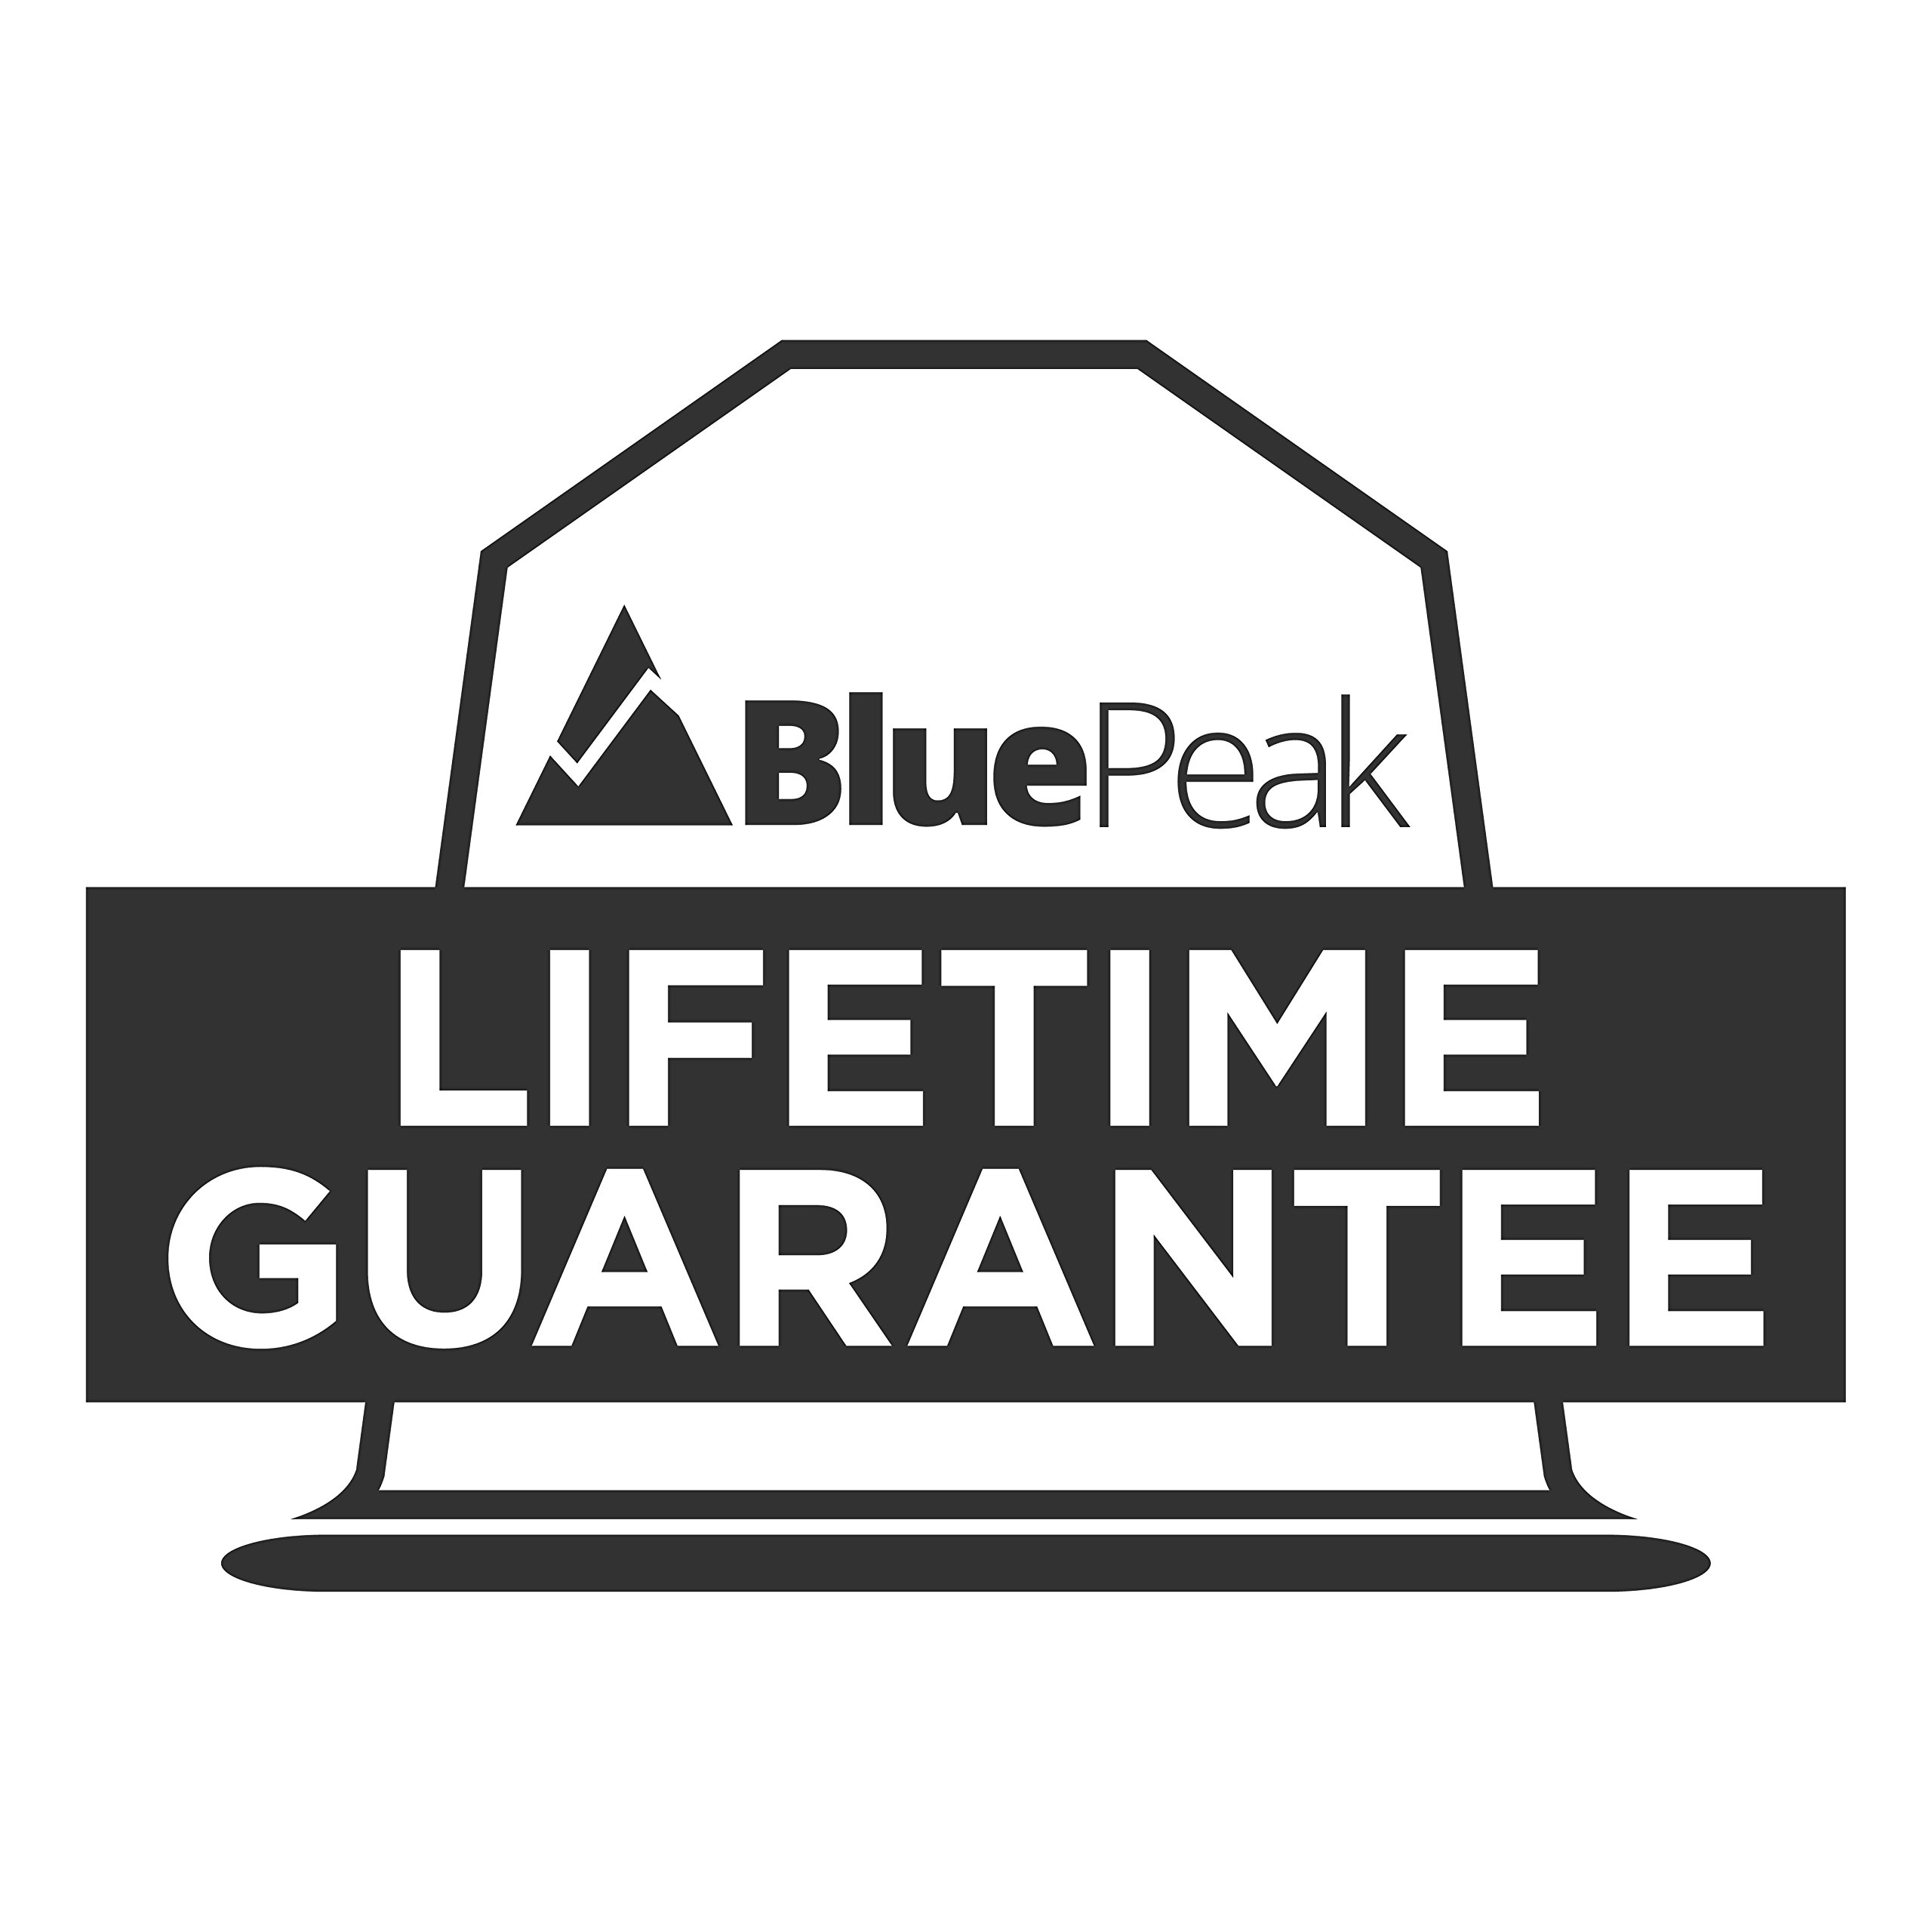 BluePeak Nespresso Coffee Capsule Rack Holder Carousel - Holds 50 Capsules OriginalLine. Elegant and Modern Chrome Finish. 360-degree Rotation. For Citiz, Pixie & Latissima Machines by BluePeak (Image #7)